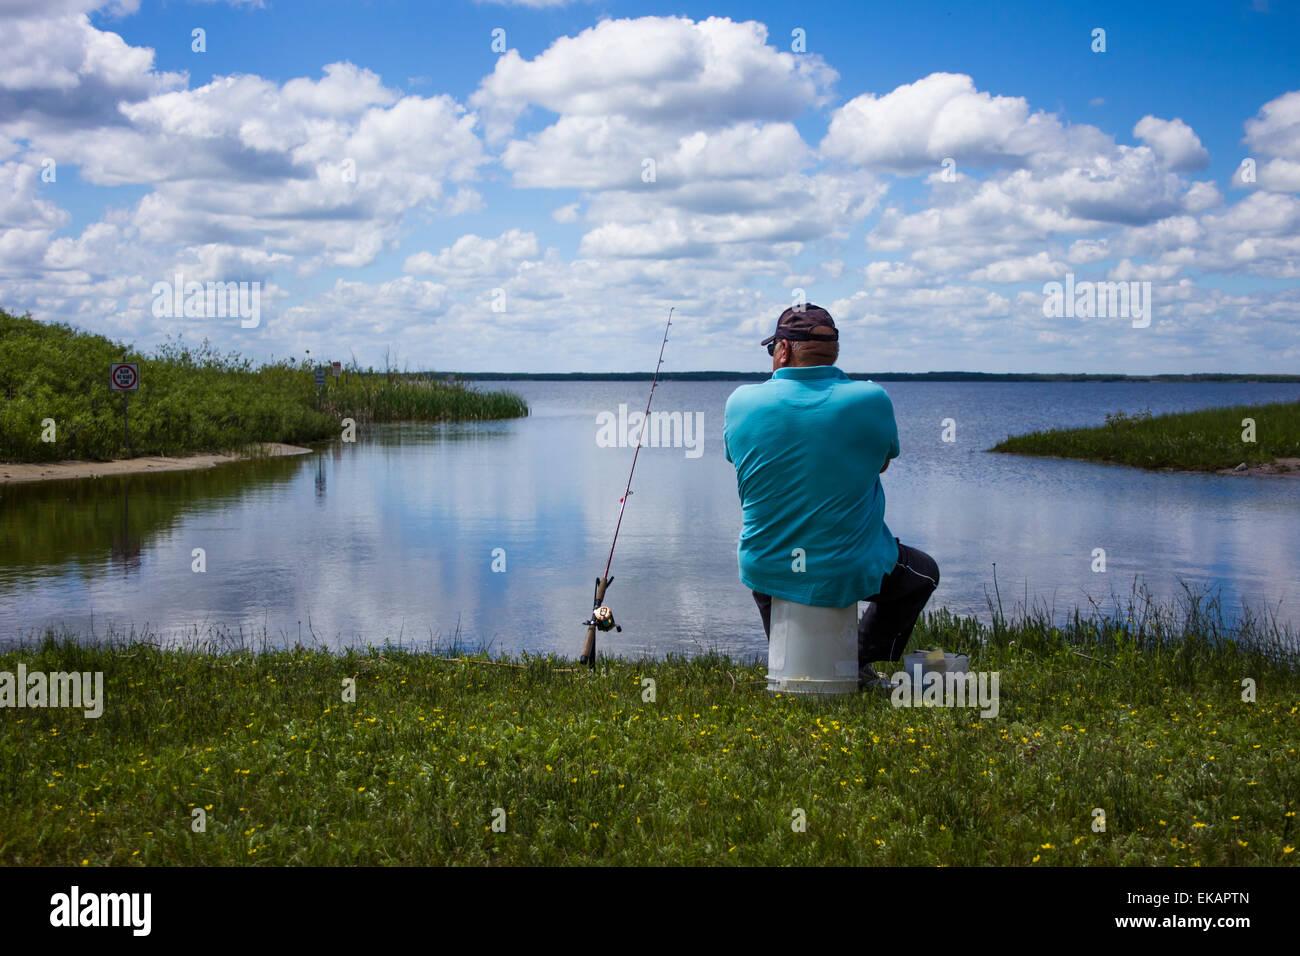 Mature man fishing at calm peaceful country lake. Stock Photo